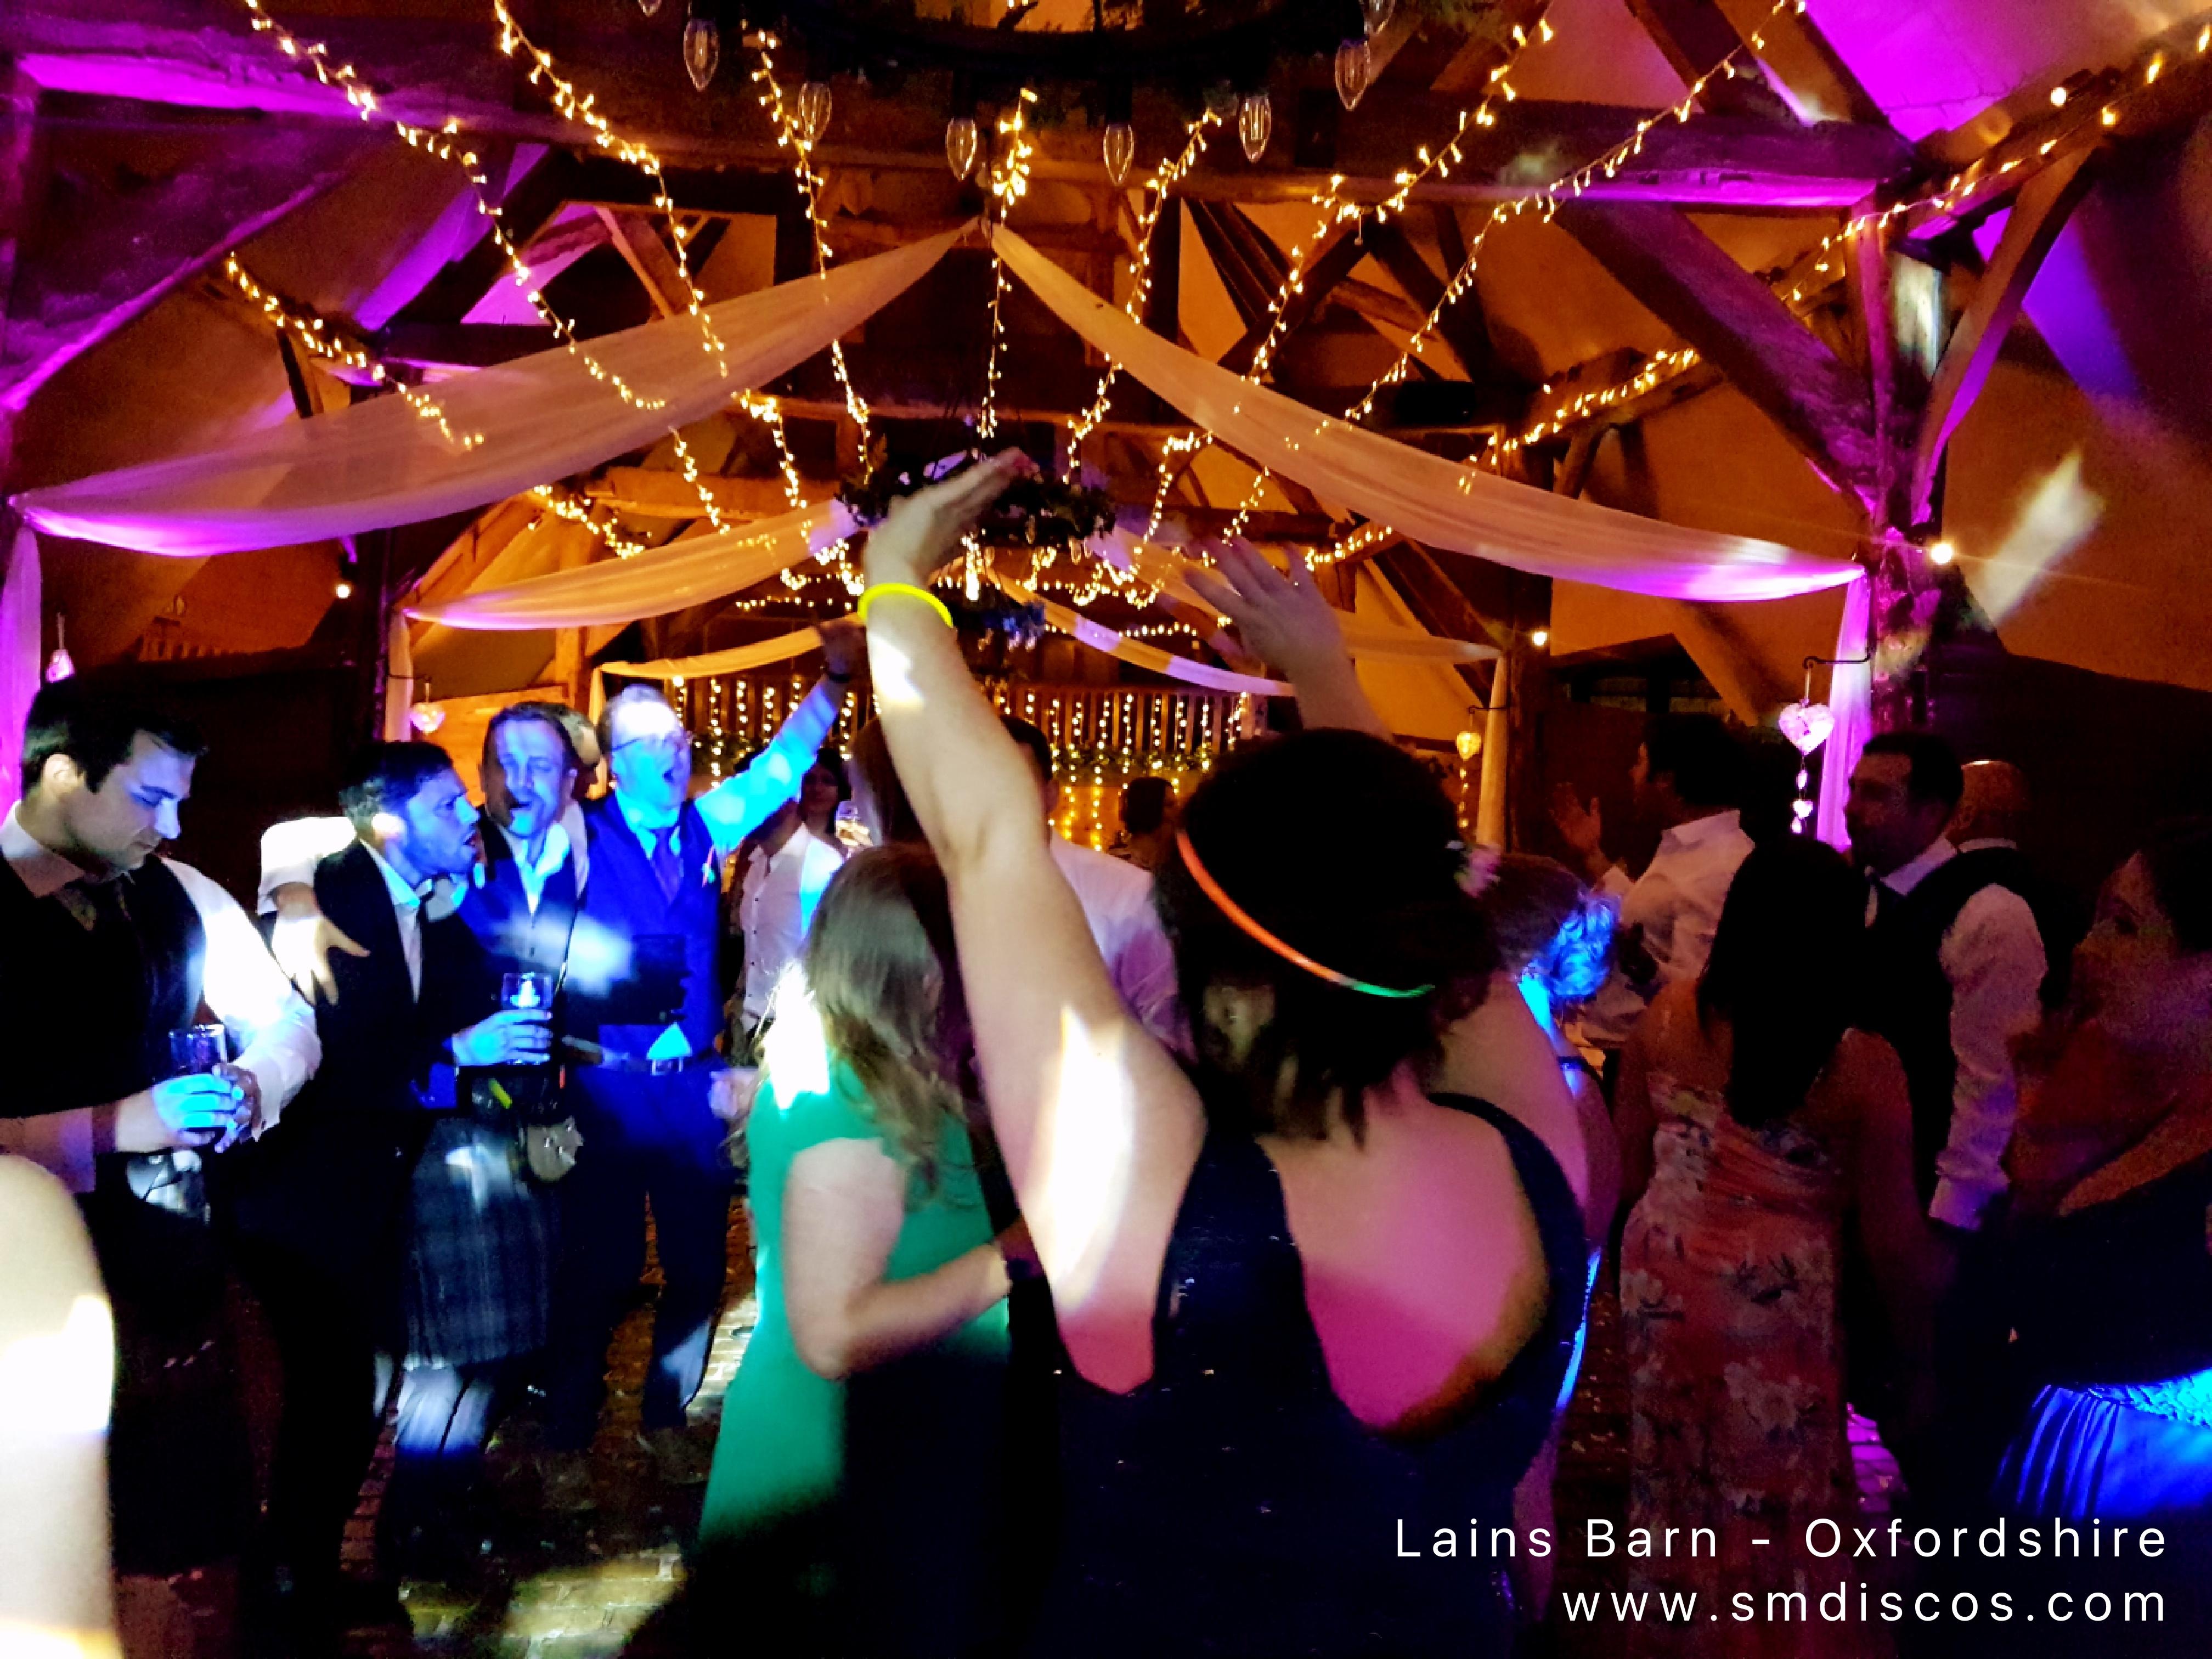 Party DJ Lains Barn